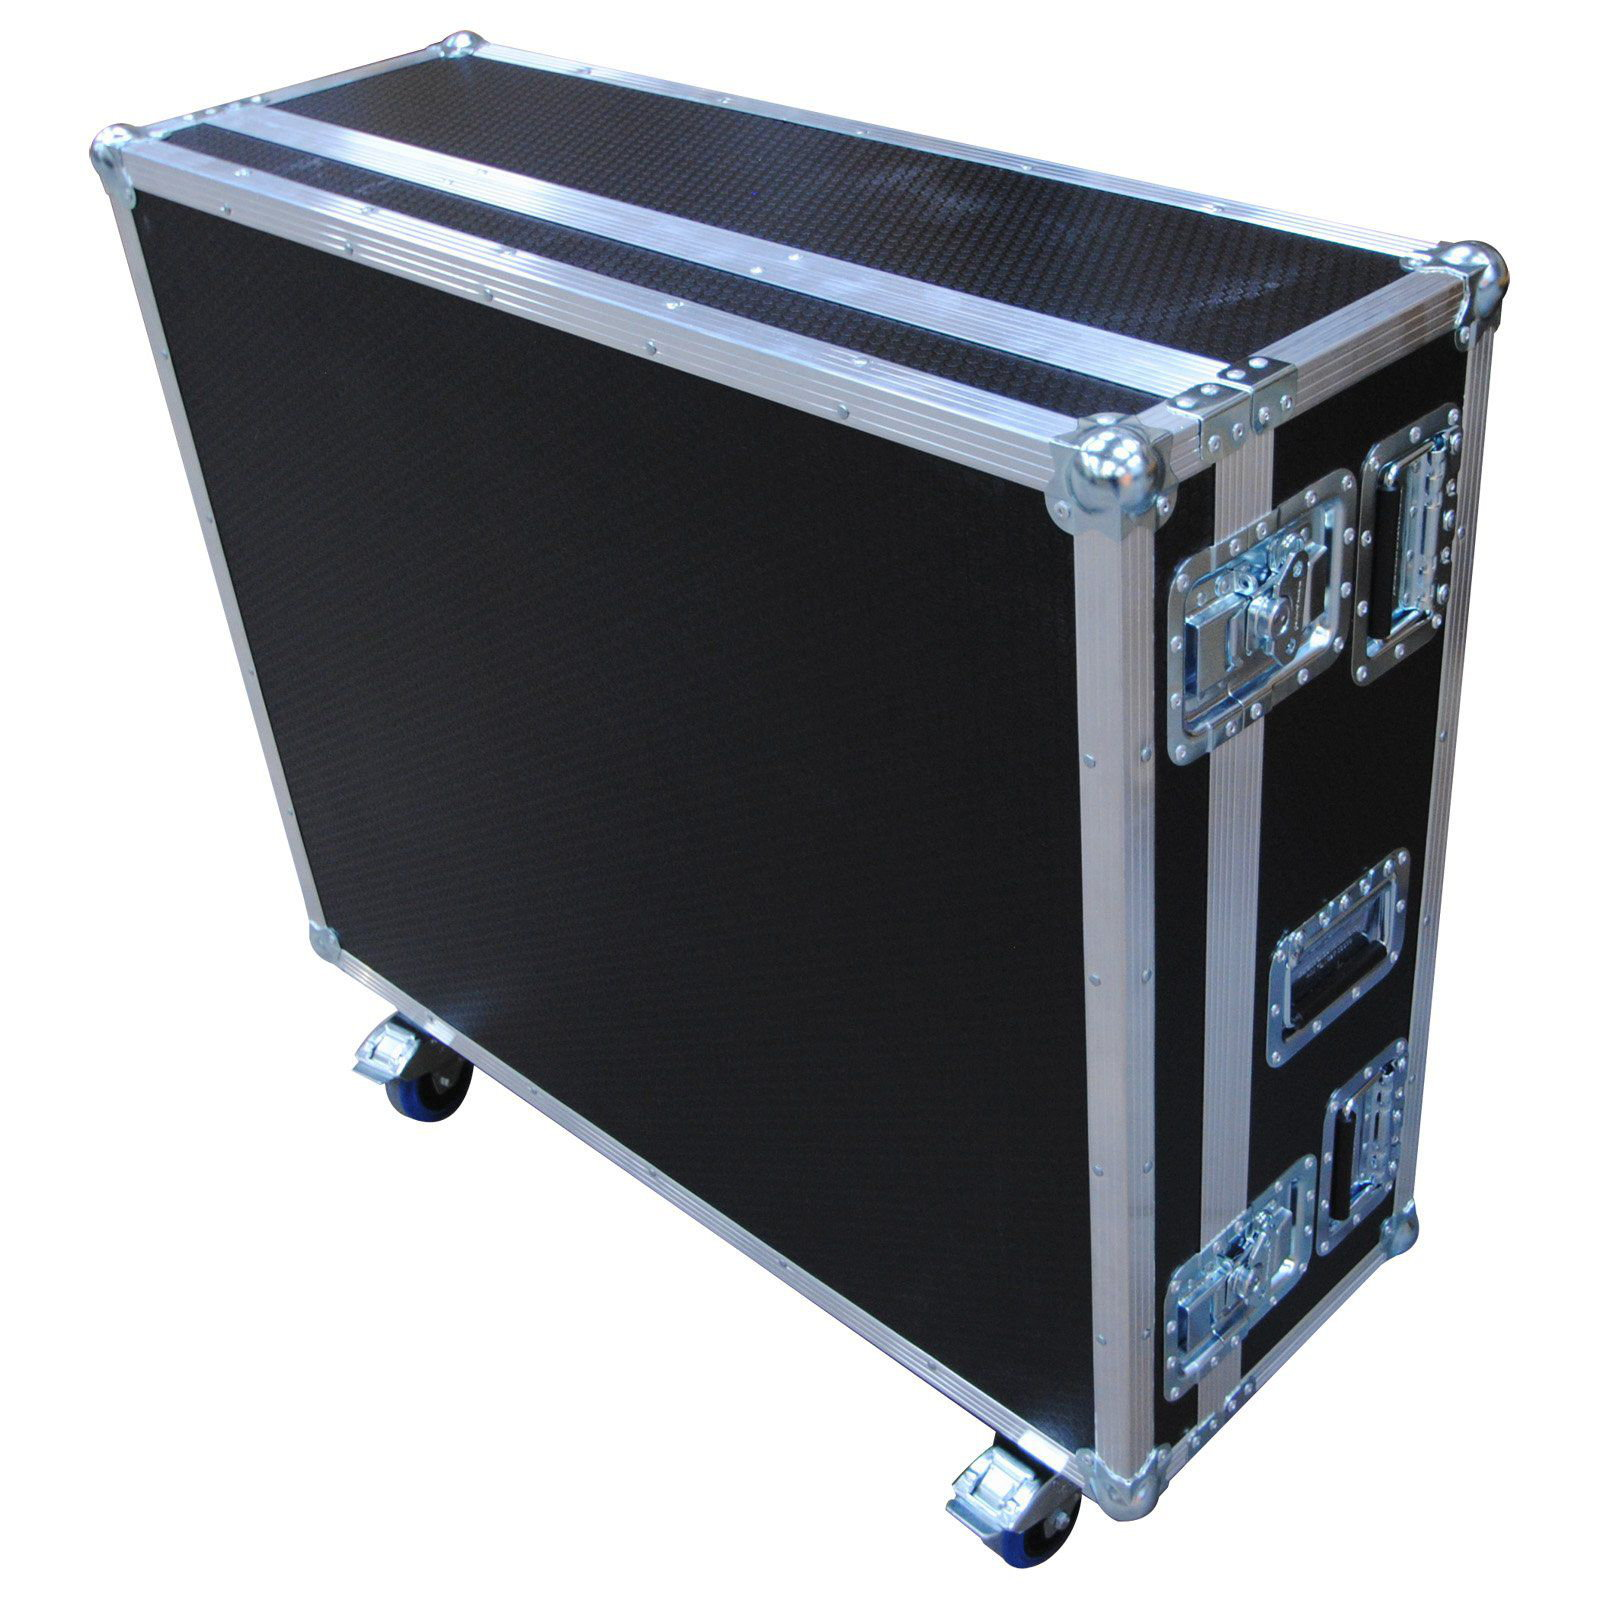 behringer x32 mixer flight case with dog box and 4 castors. Black Bedroom Furniture Sets. Home Design Ideas